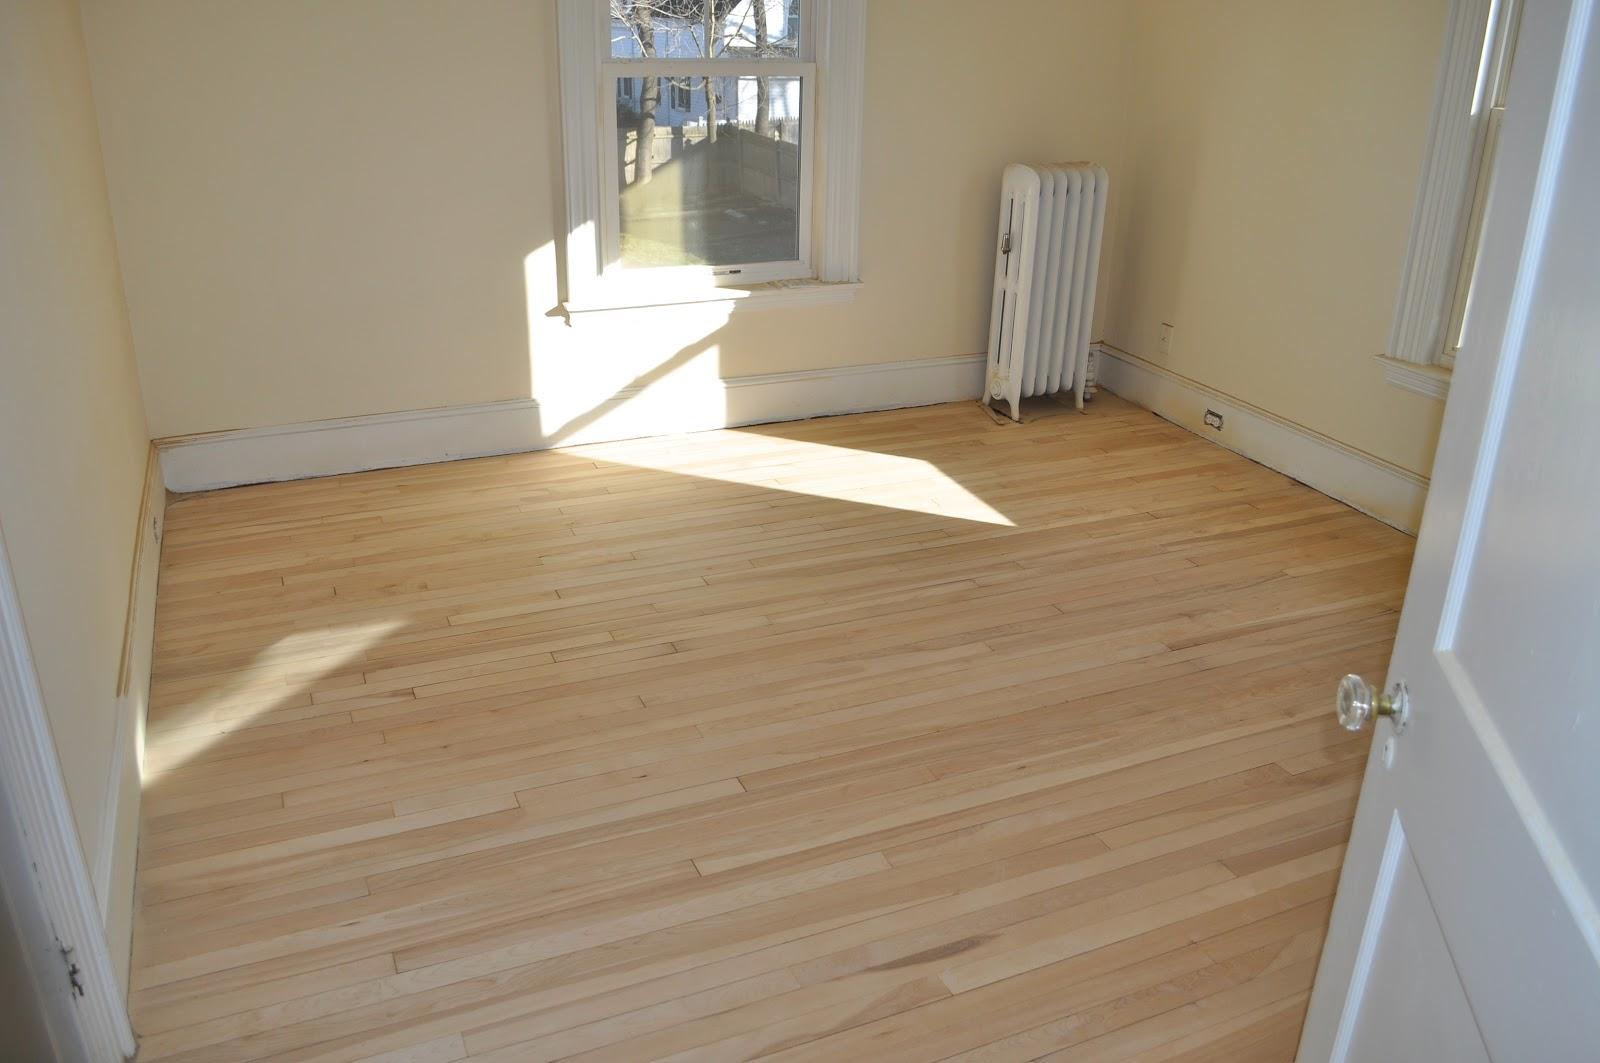 Sopo Cottage From Shabby To Shiny Floor Refinishing